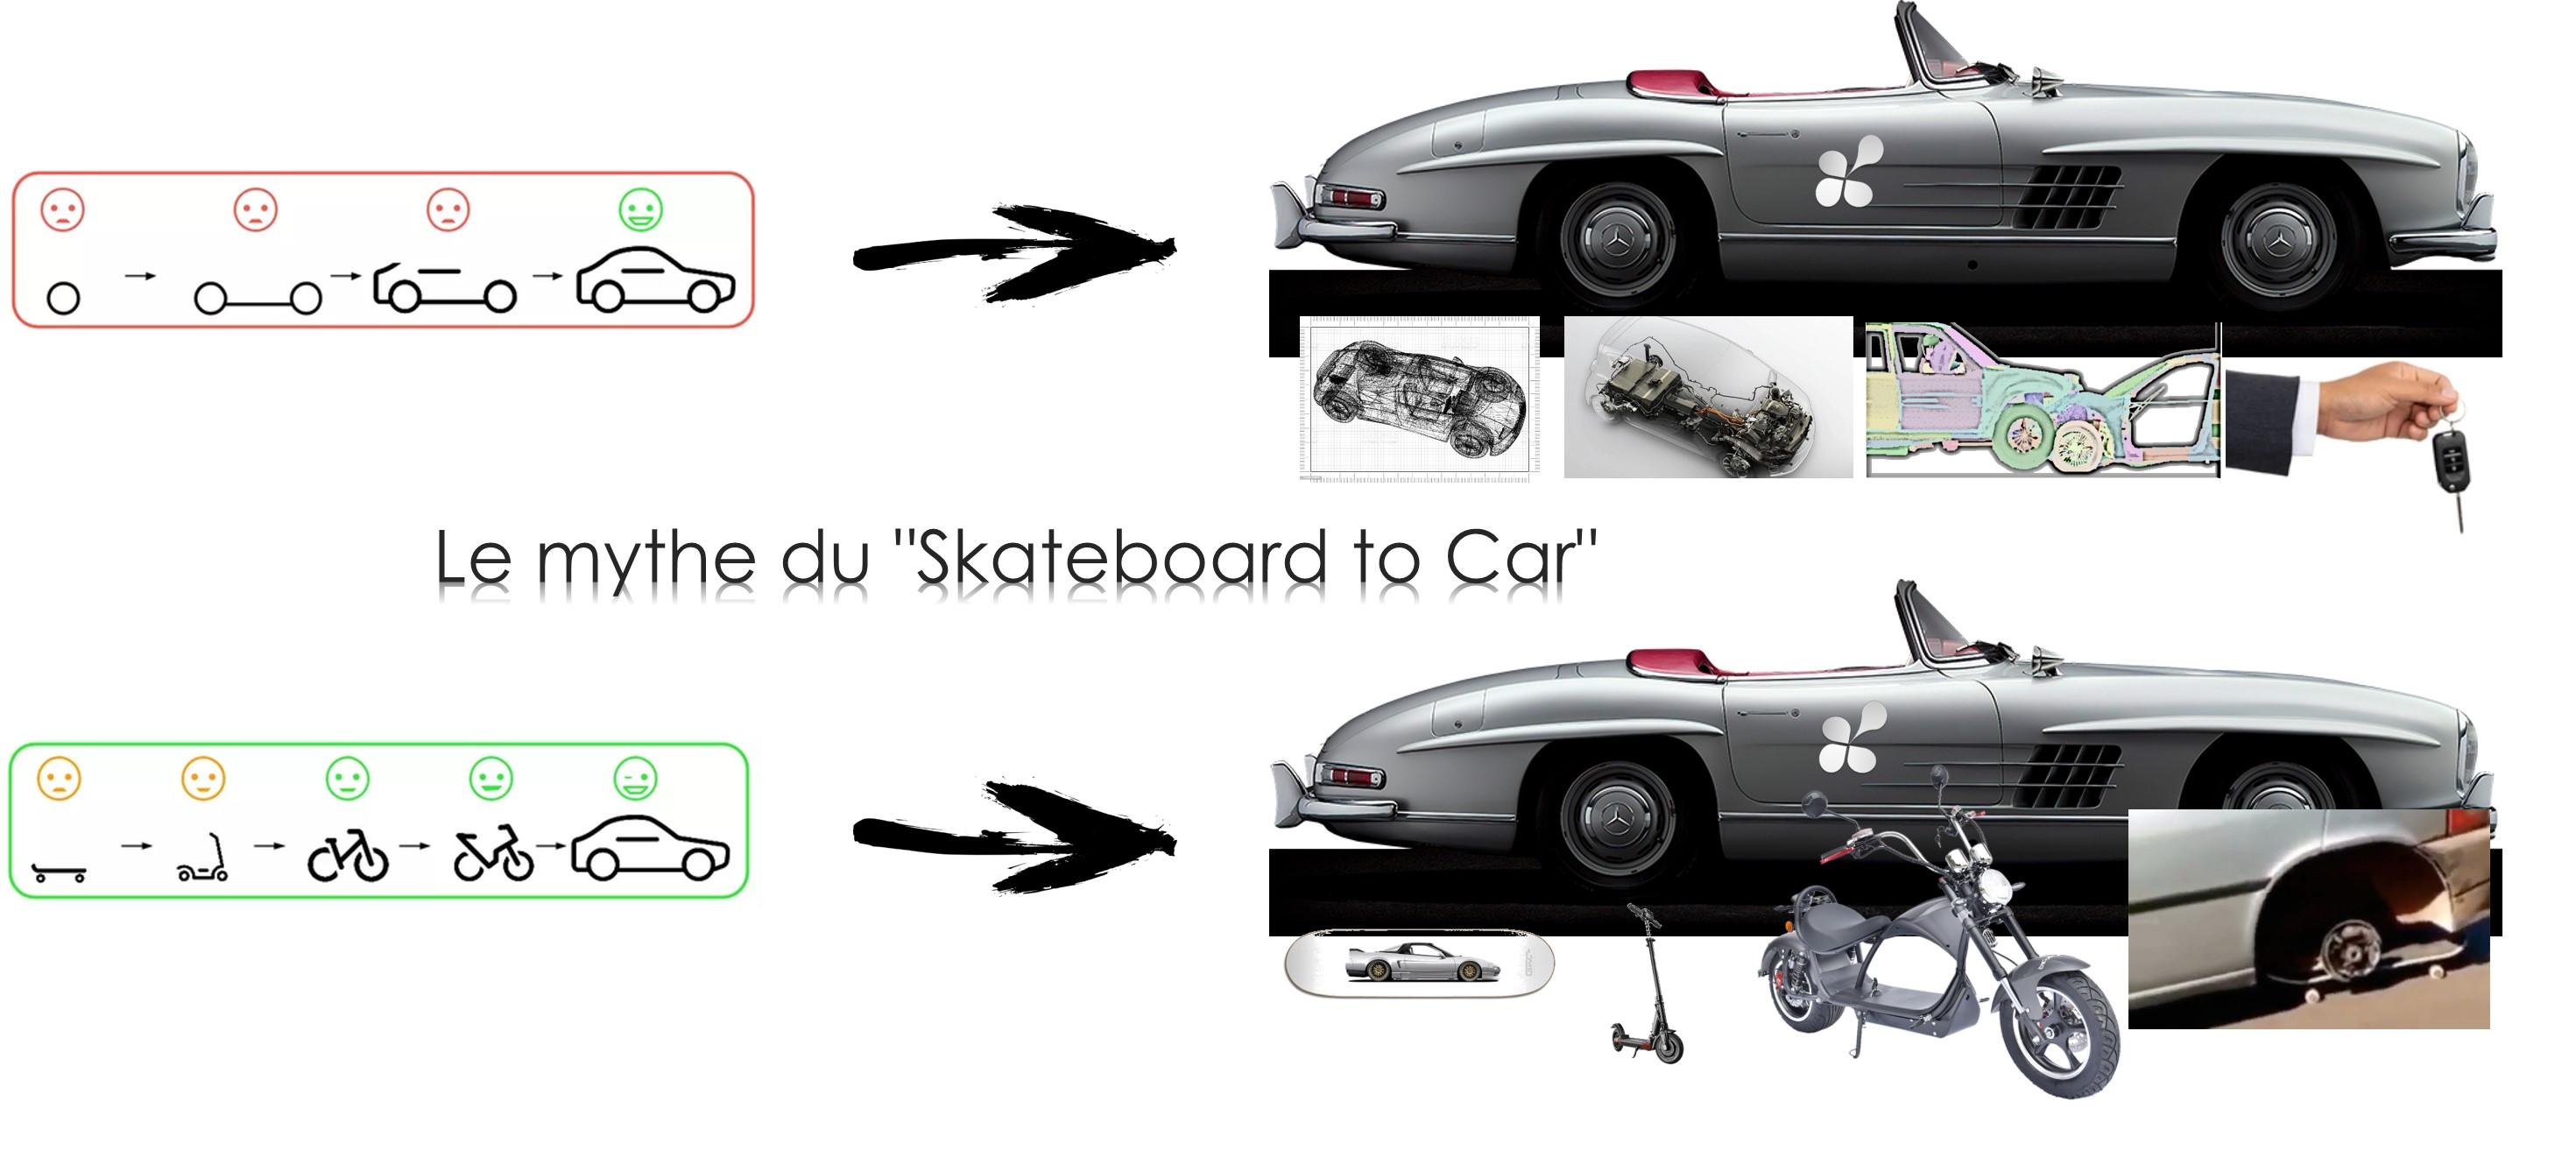 mythe du Skateboard to Carjpg